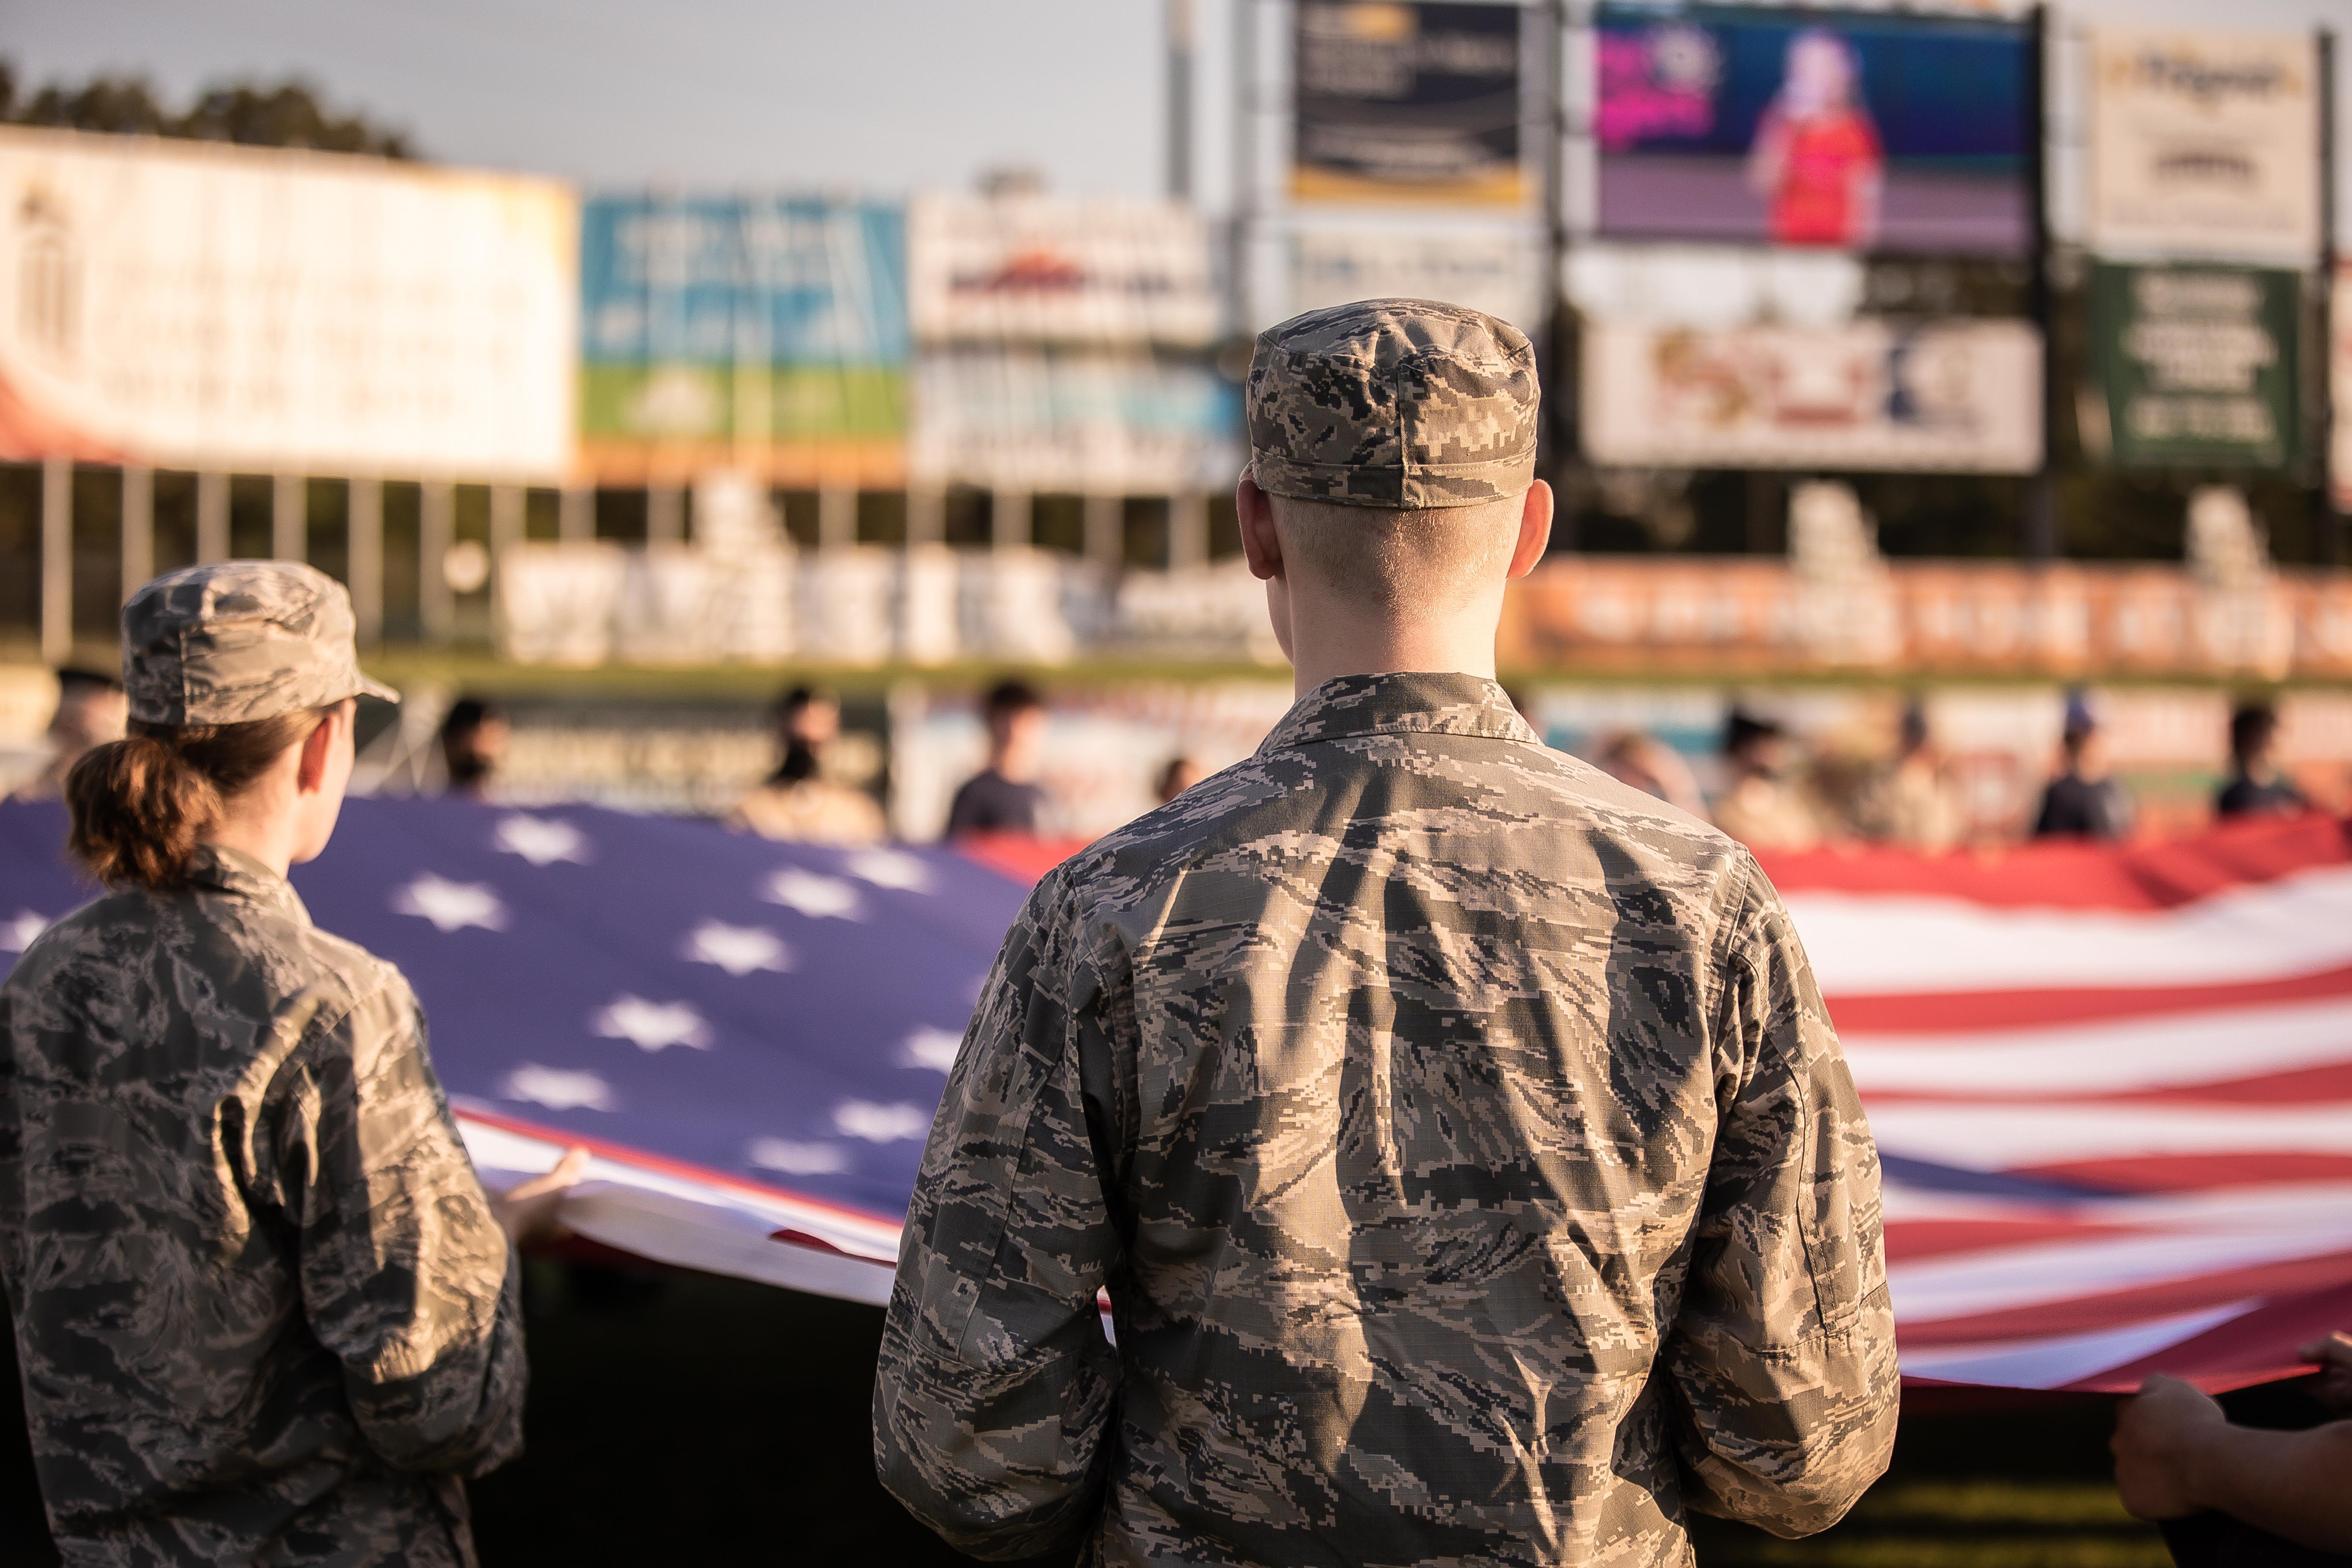 Trollinger Law Honors 9/11 Heroes at First Responders Baseball Game